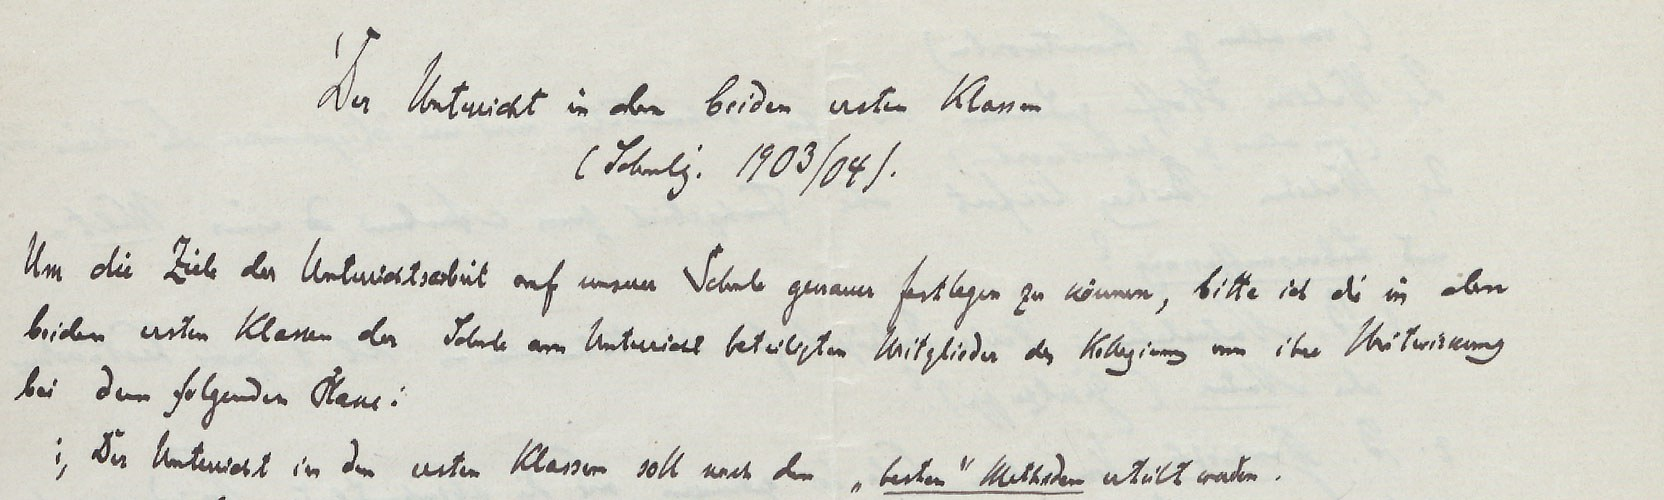 Autograph of Hugo Gaudig